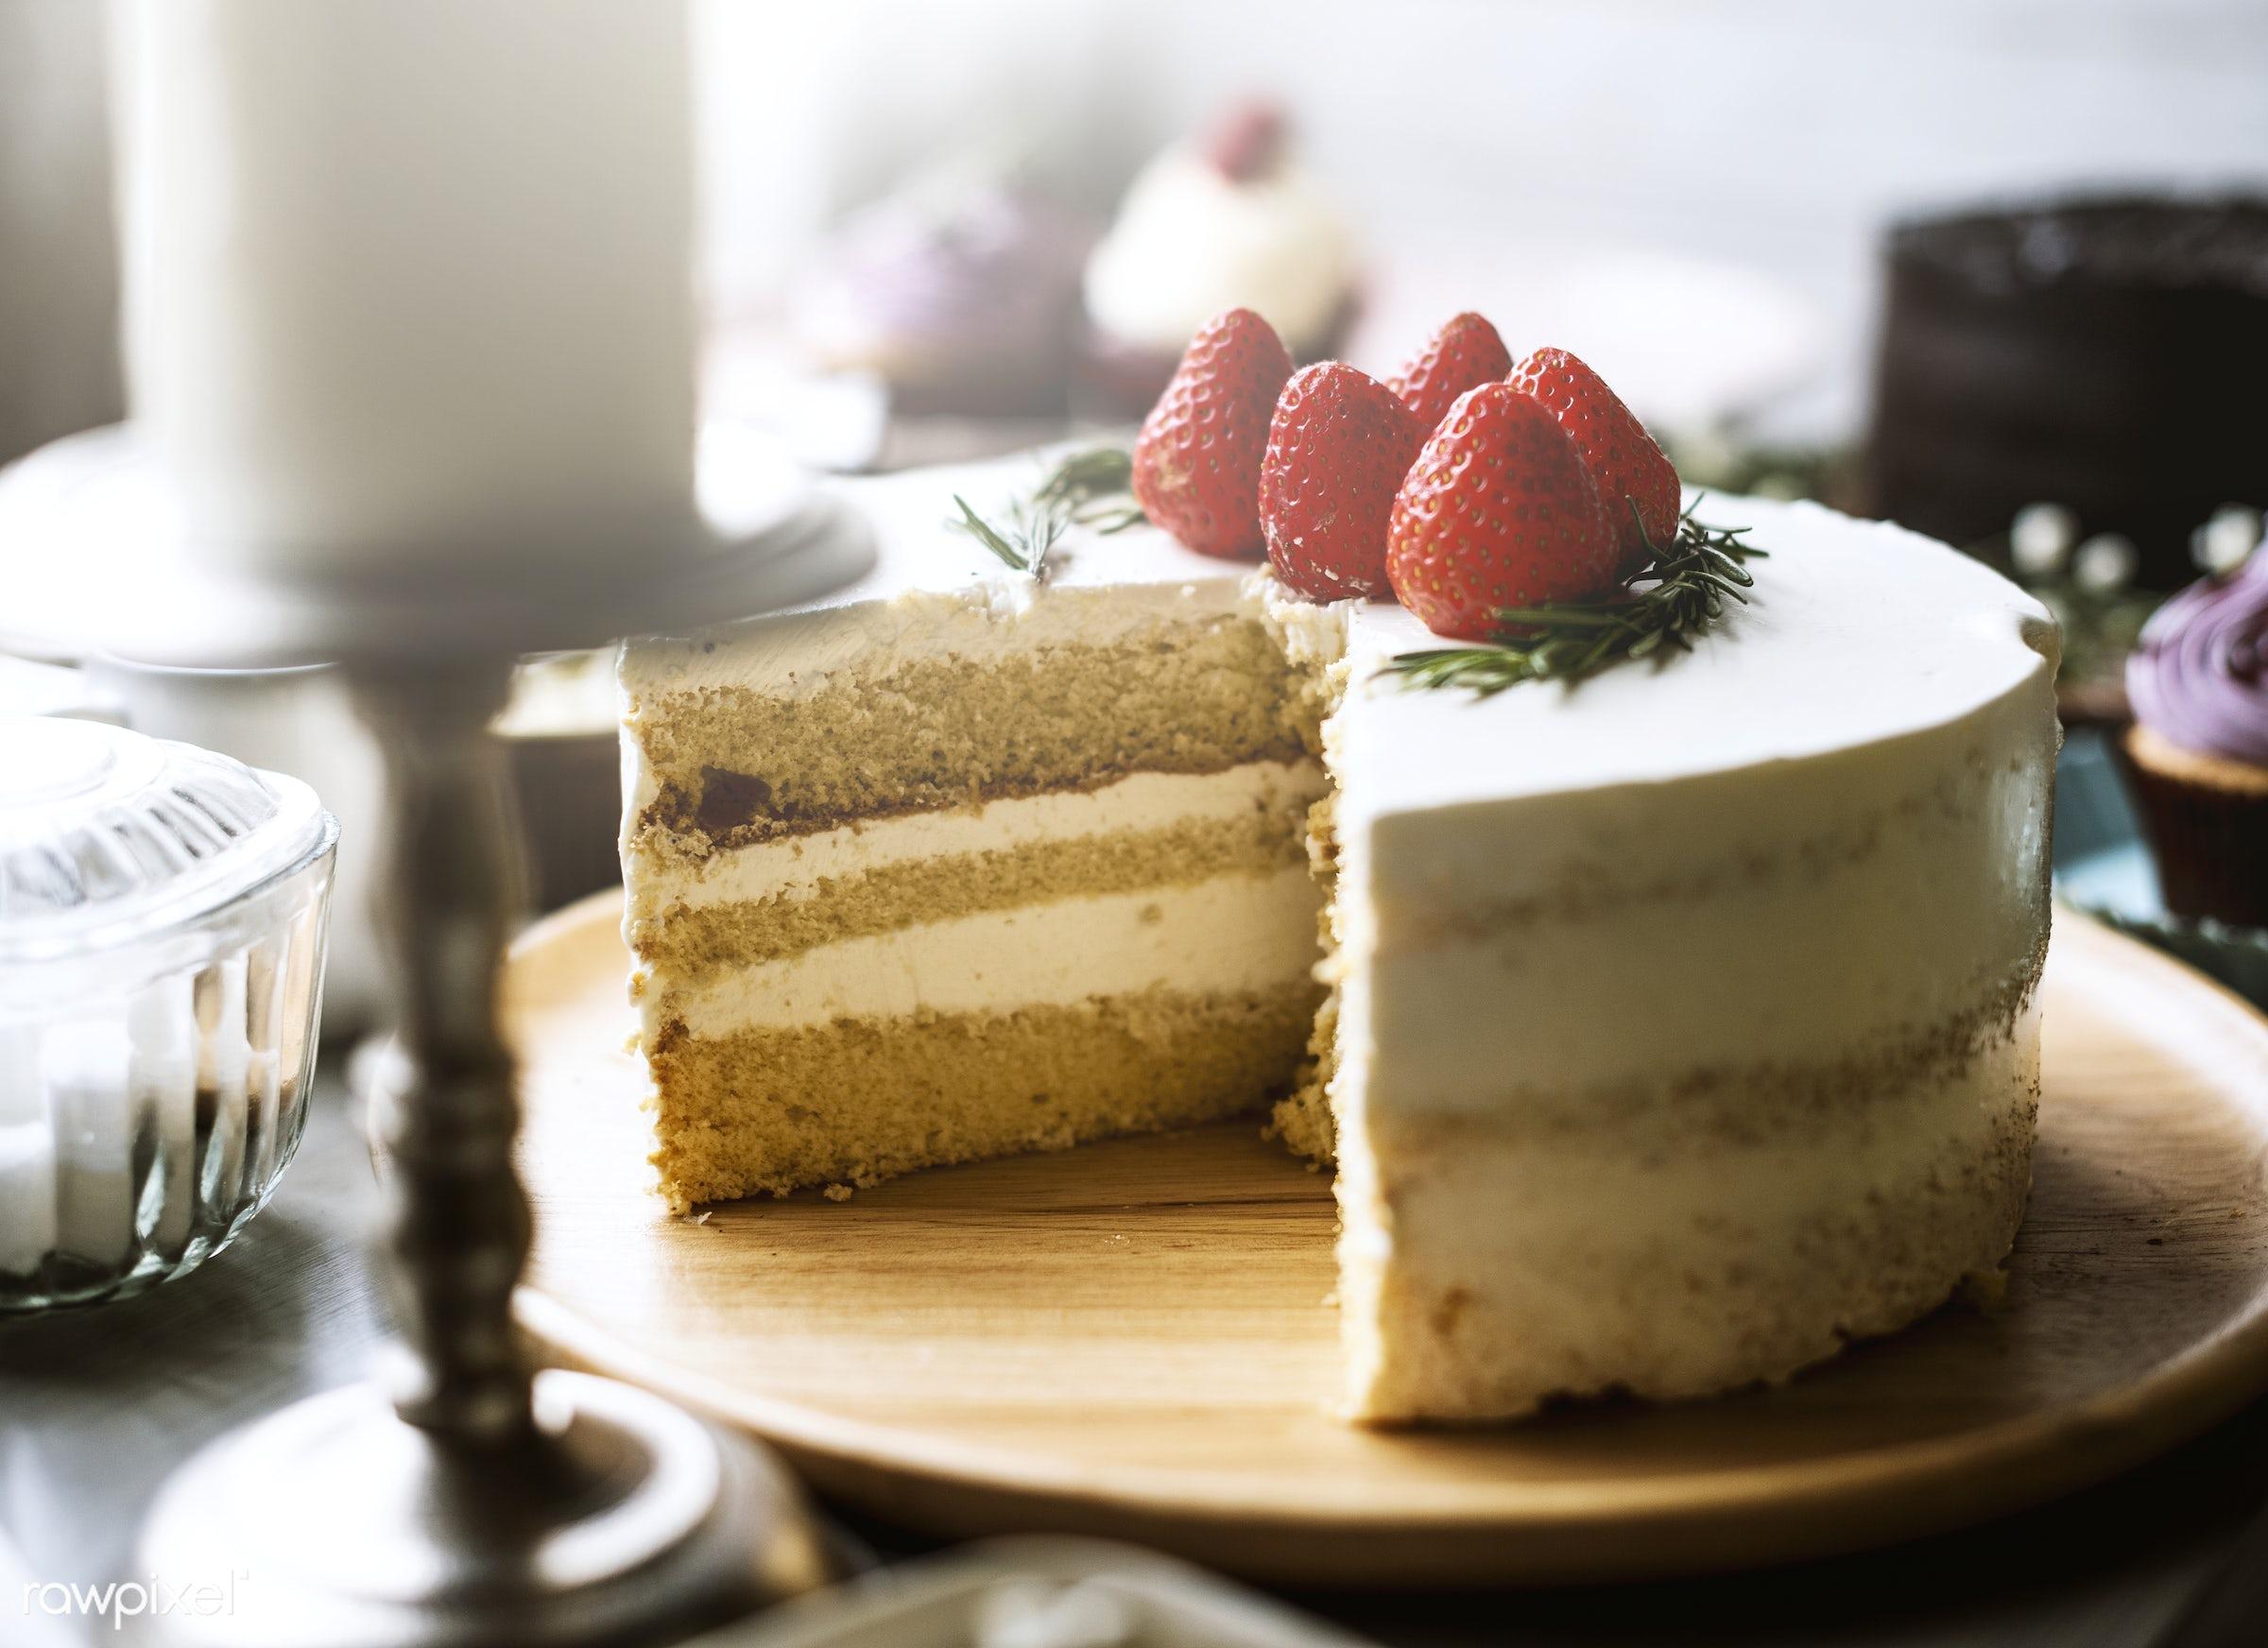 sweet, food, strawberry, bake, baked, bakery, birthday, break, cake, cakes, catering, celebrate, celebration, cream, cut,...